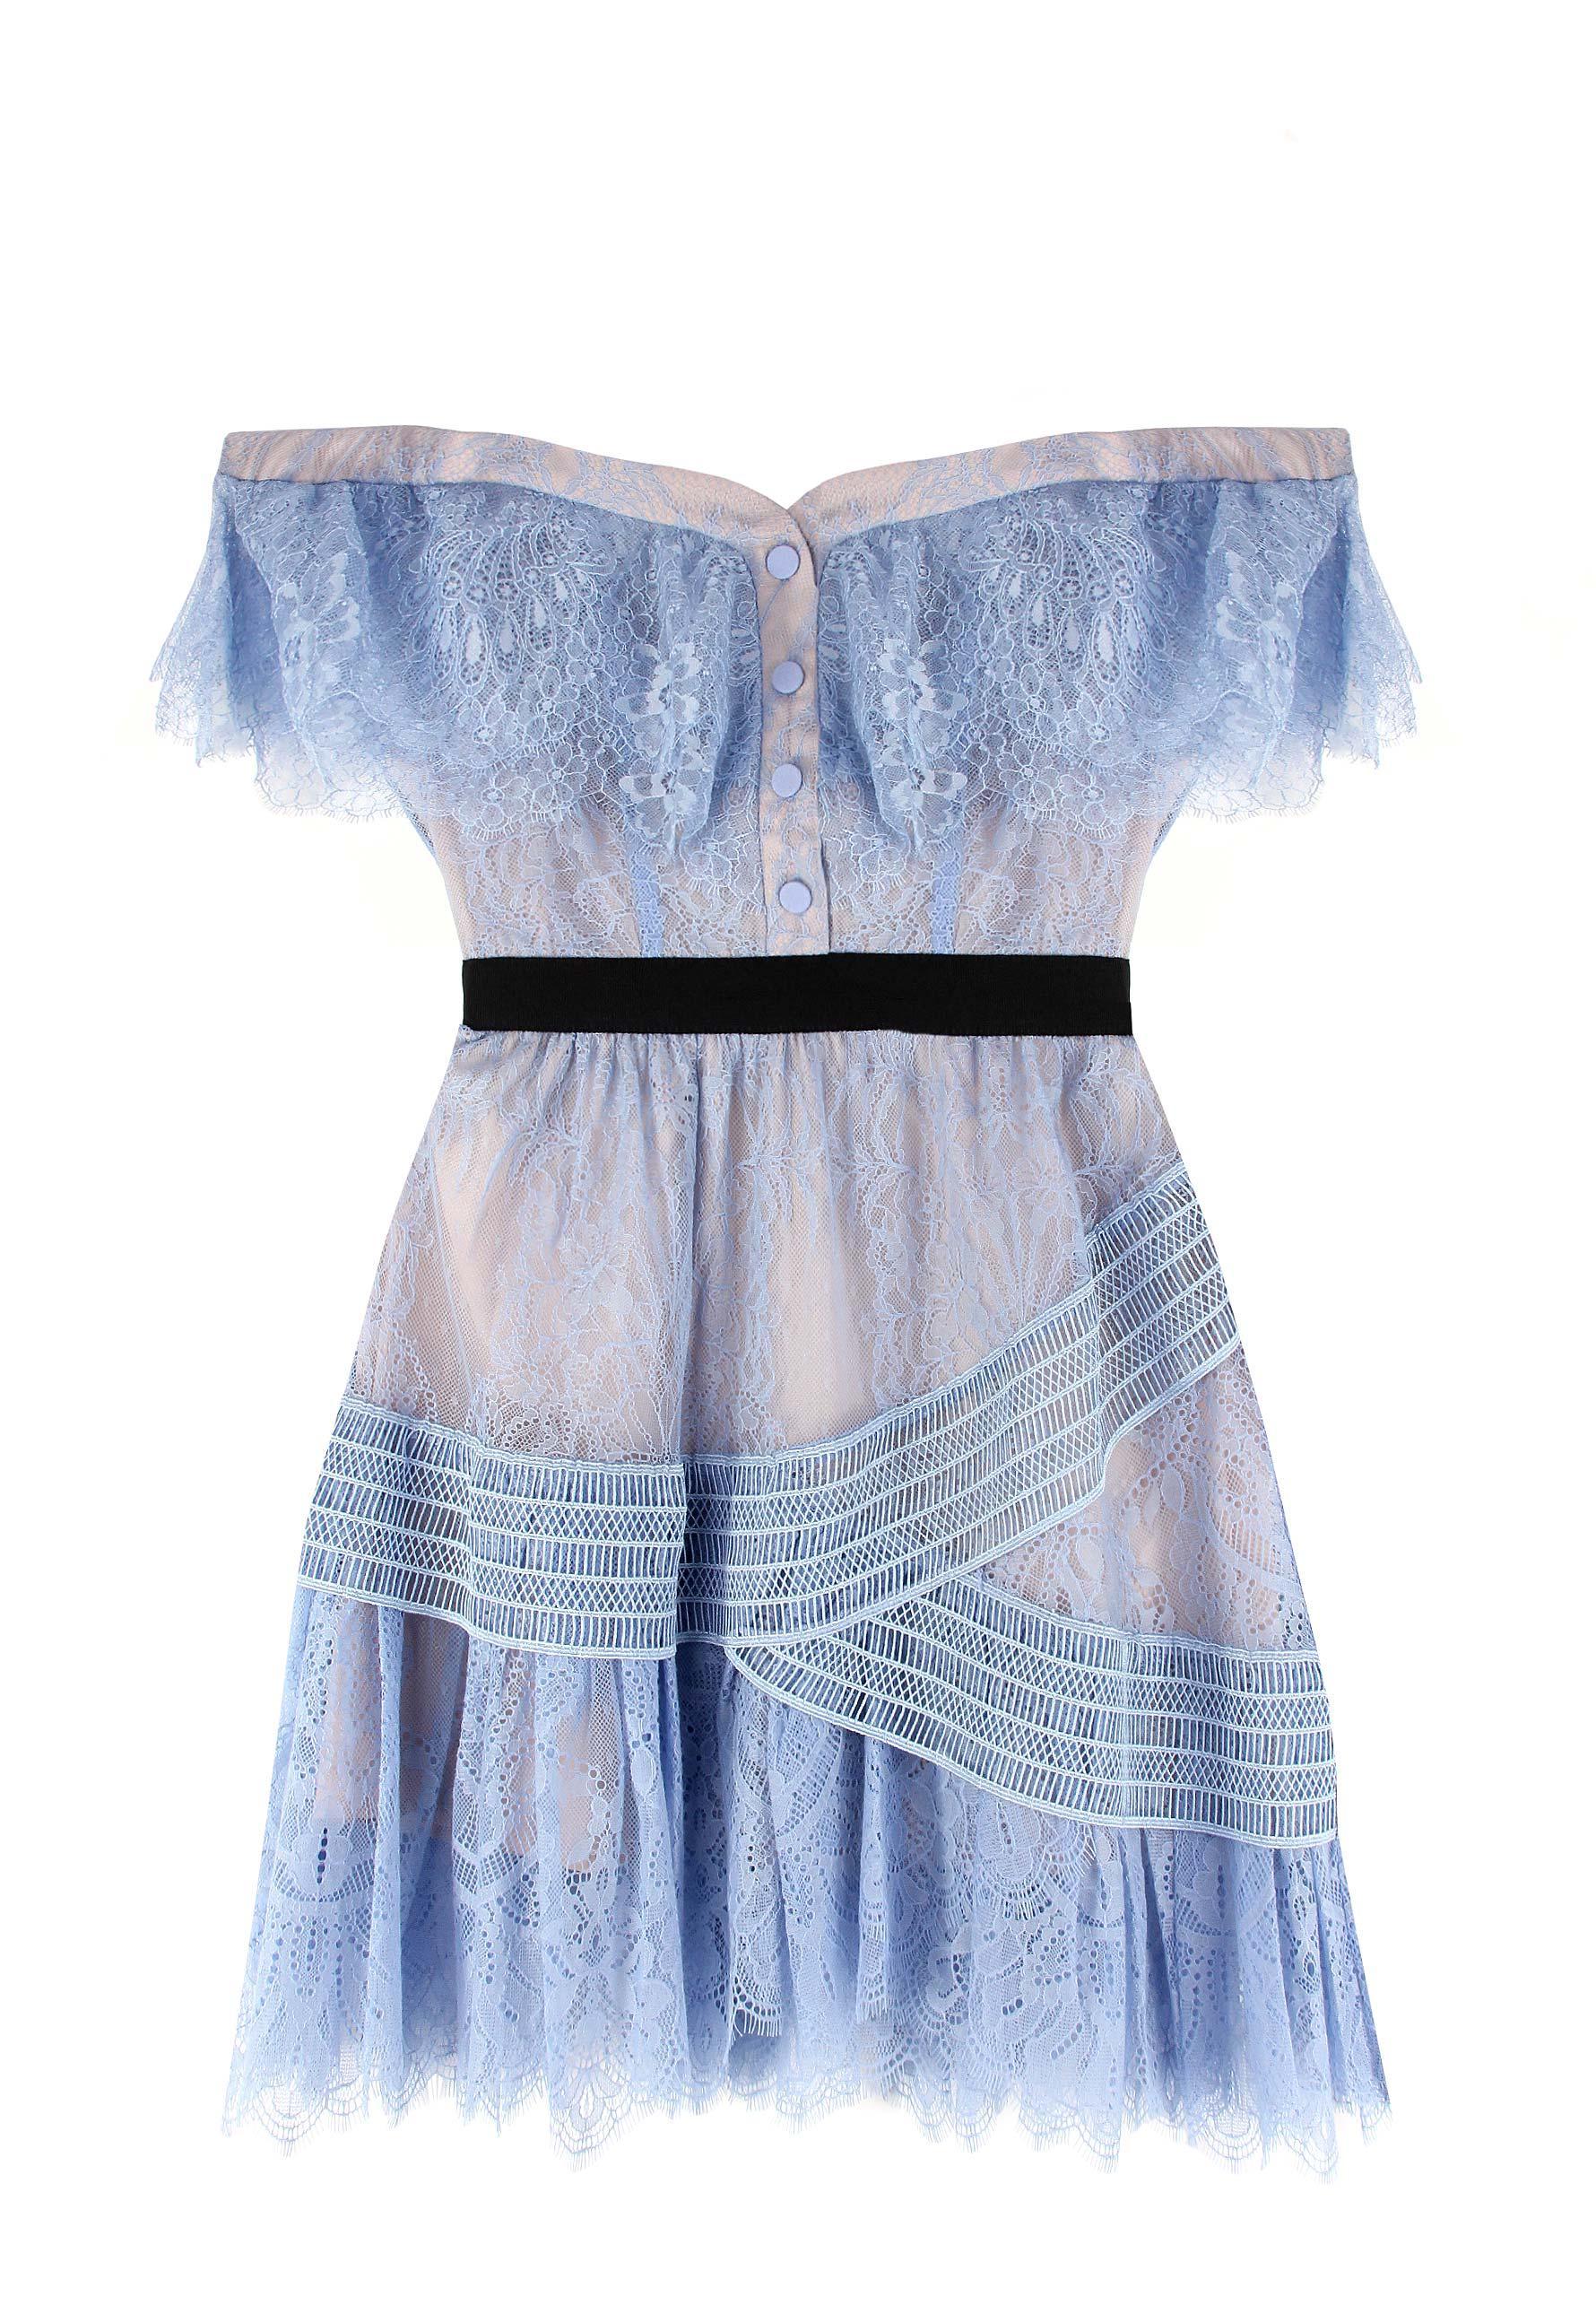 1ce81614a207 Self-Portrait Off Shoulder Fine Lace Mini Dress Blue in Blue - Lyst